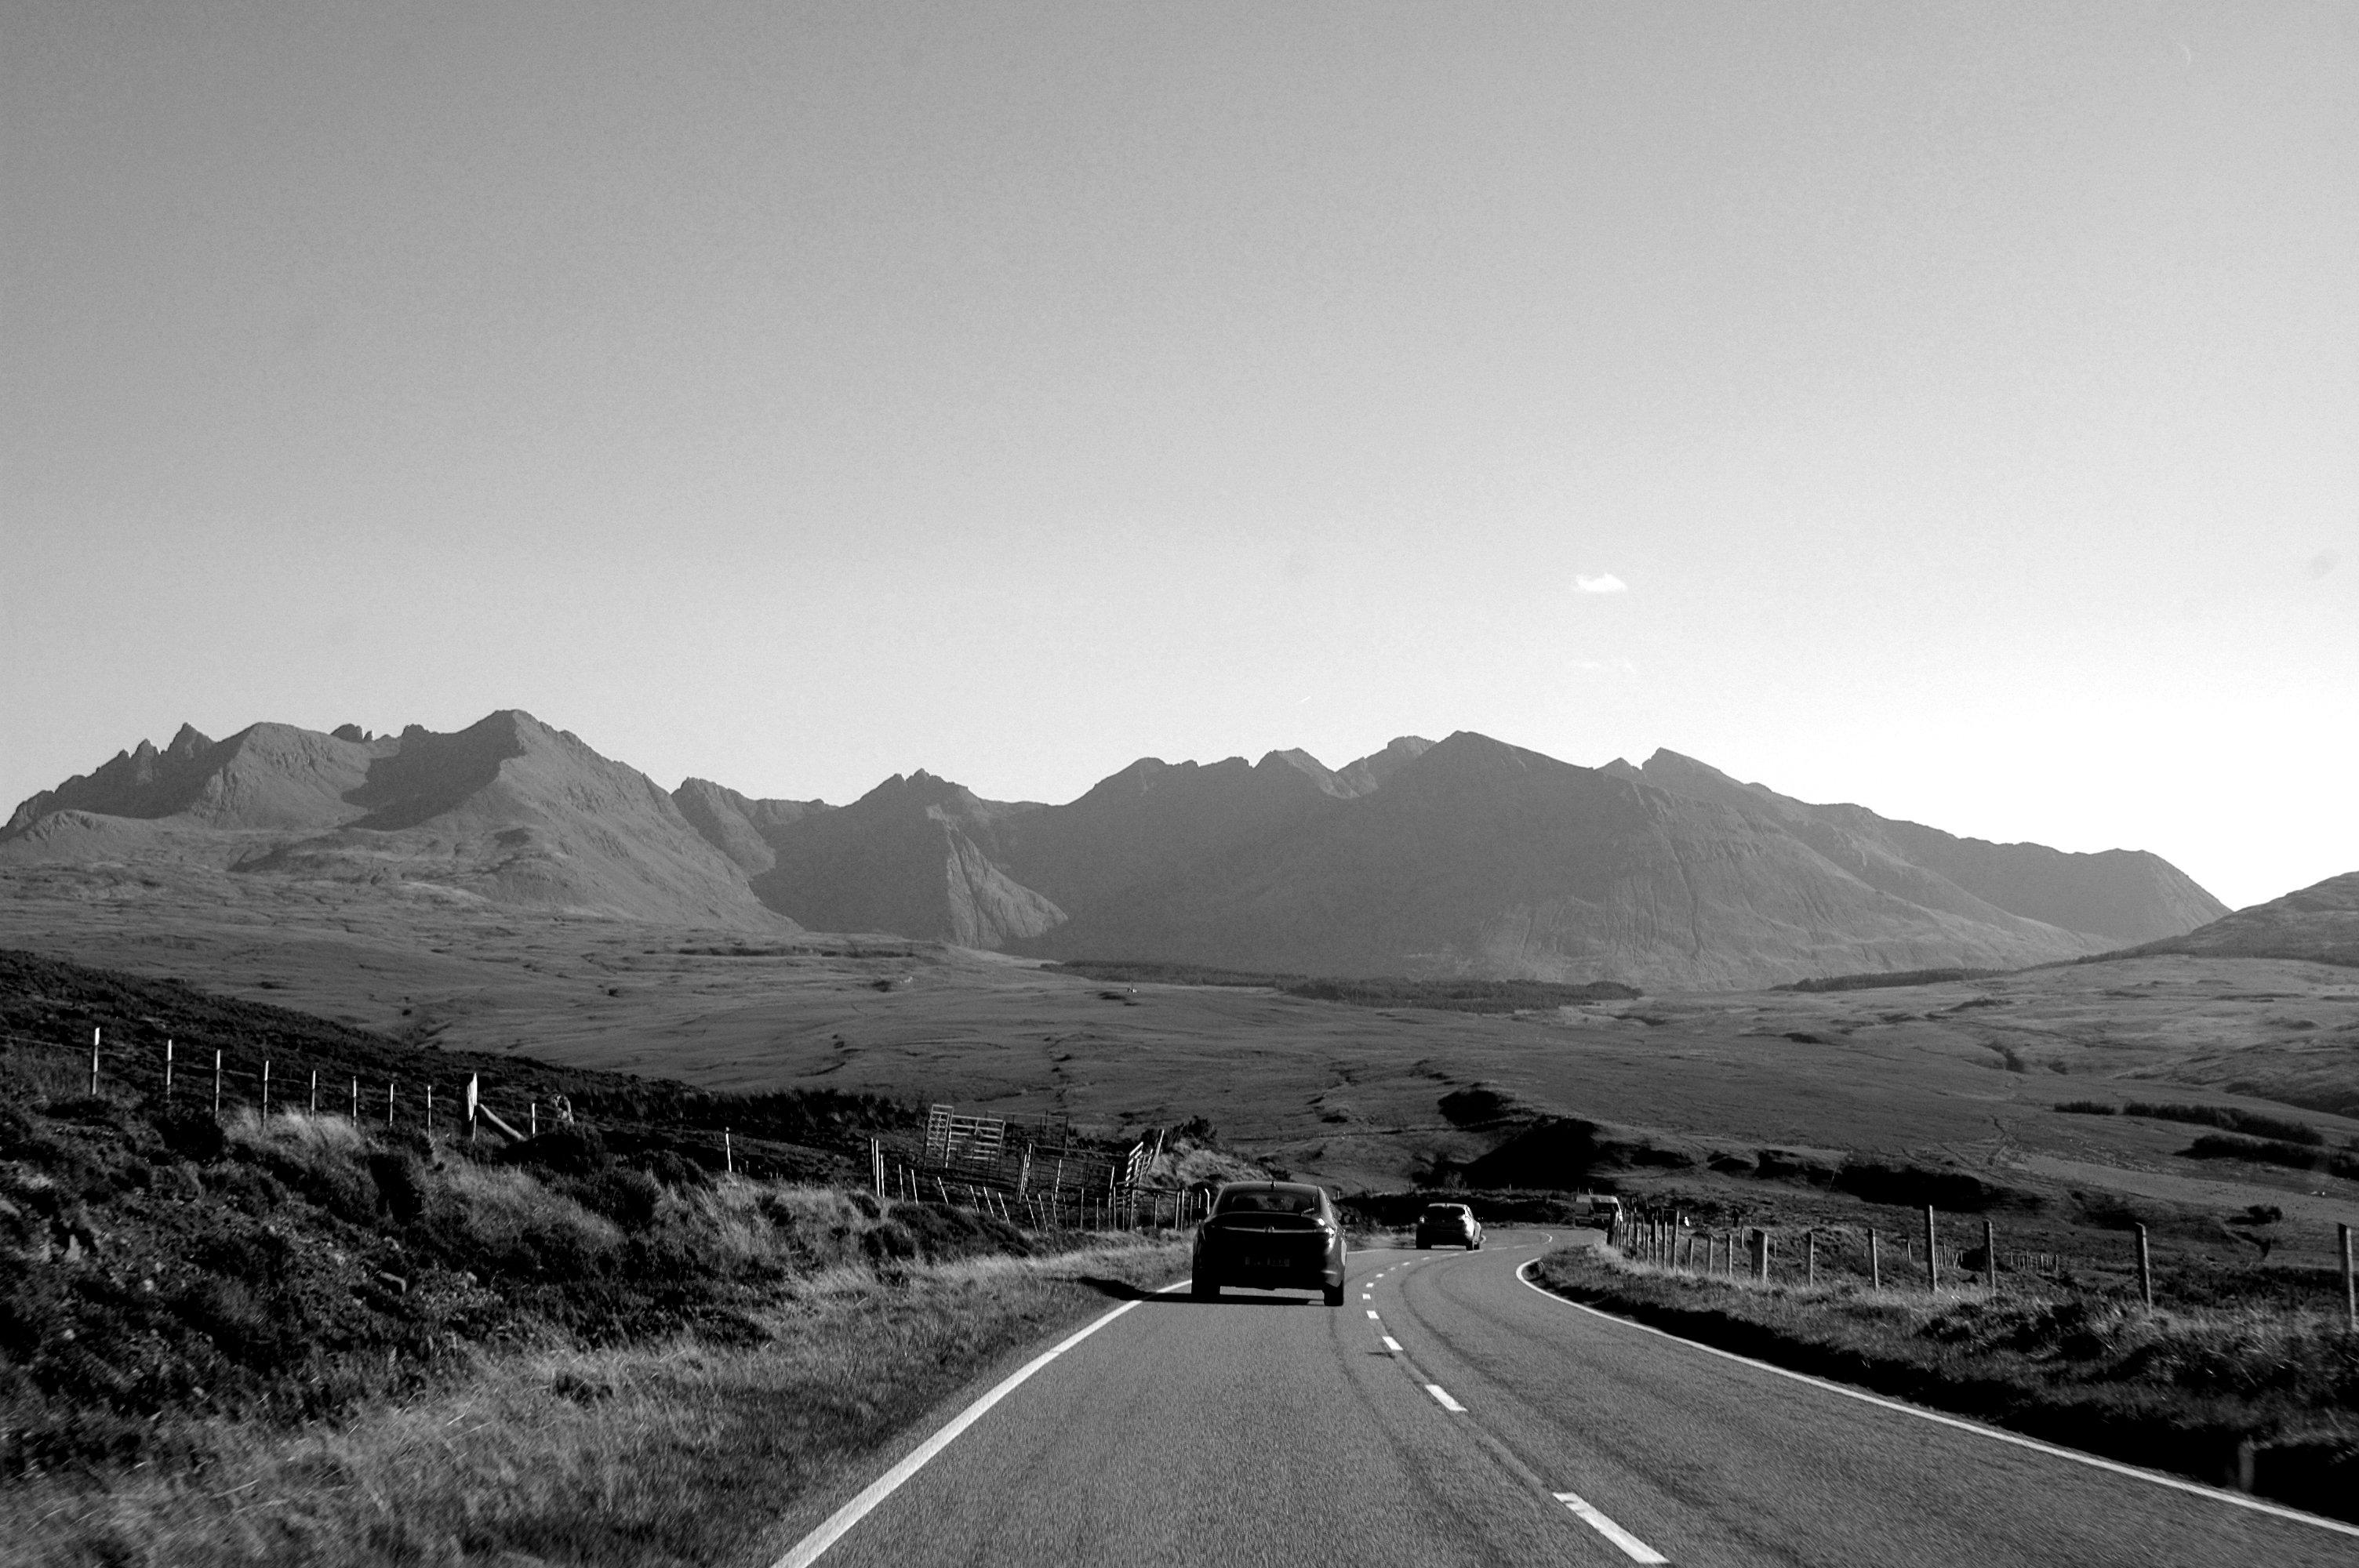 Isle of Skye Landscape - Old Man of Storr Sunrise Isle of Skye - 30 Photos of the Isle of Skye to Ignite Your Wanderlust